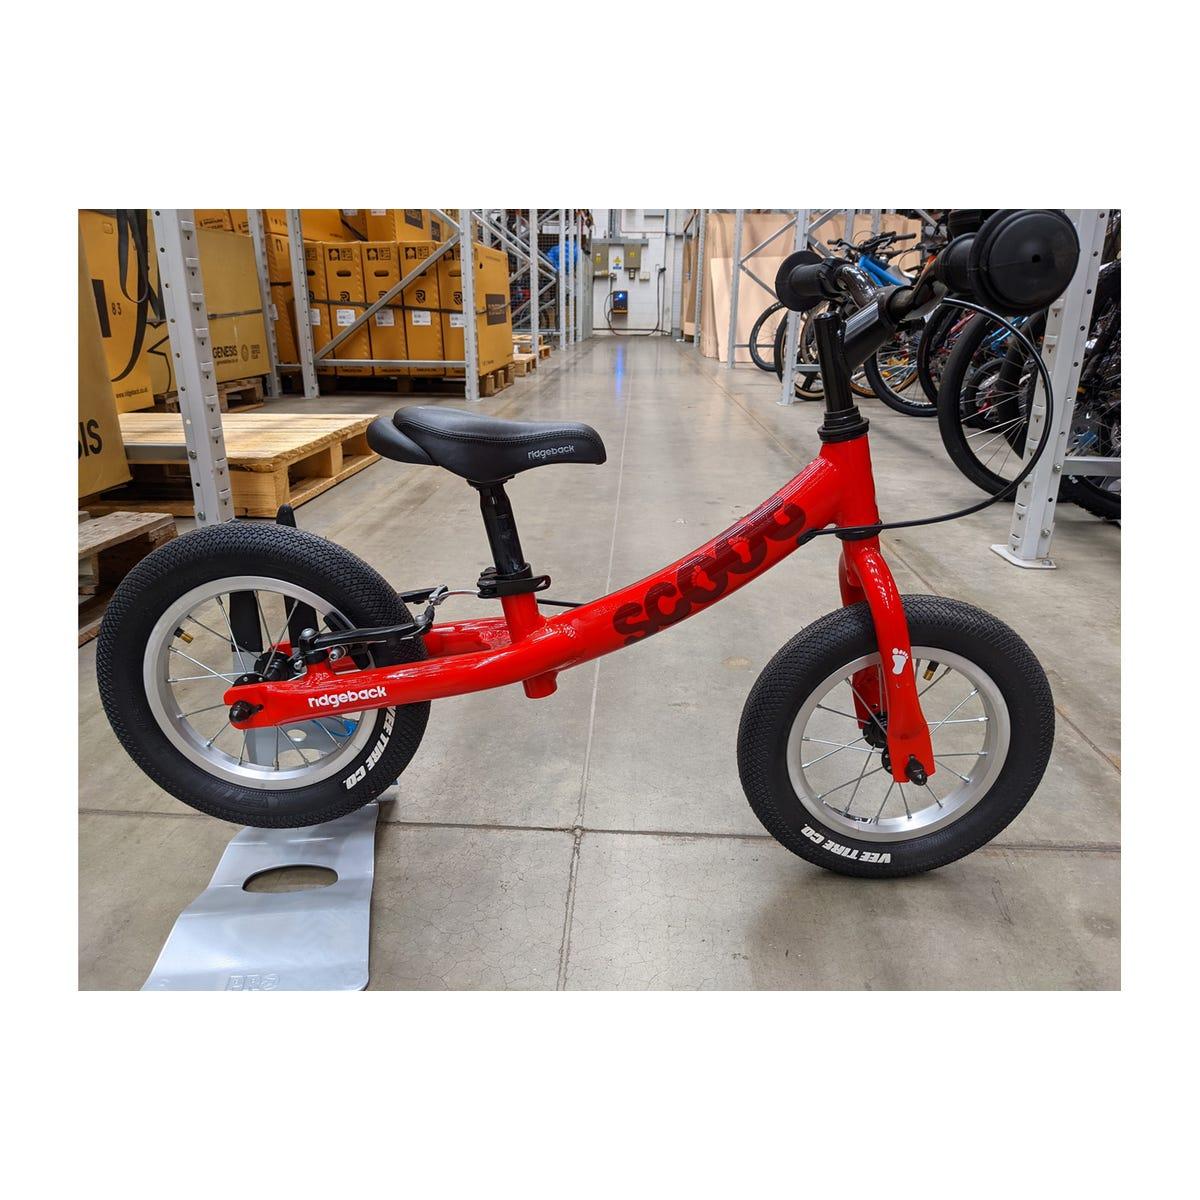 Ridgeback 2020  Scoot Red Ex Brand Sample Bike